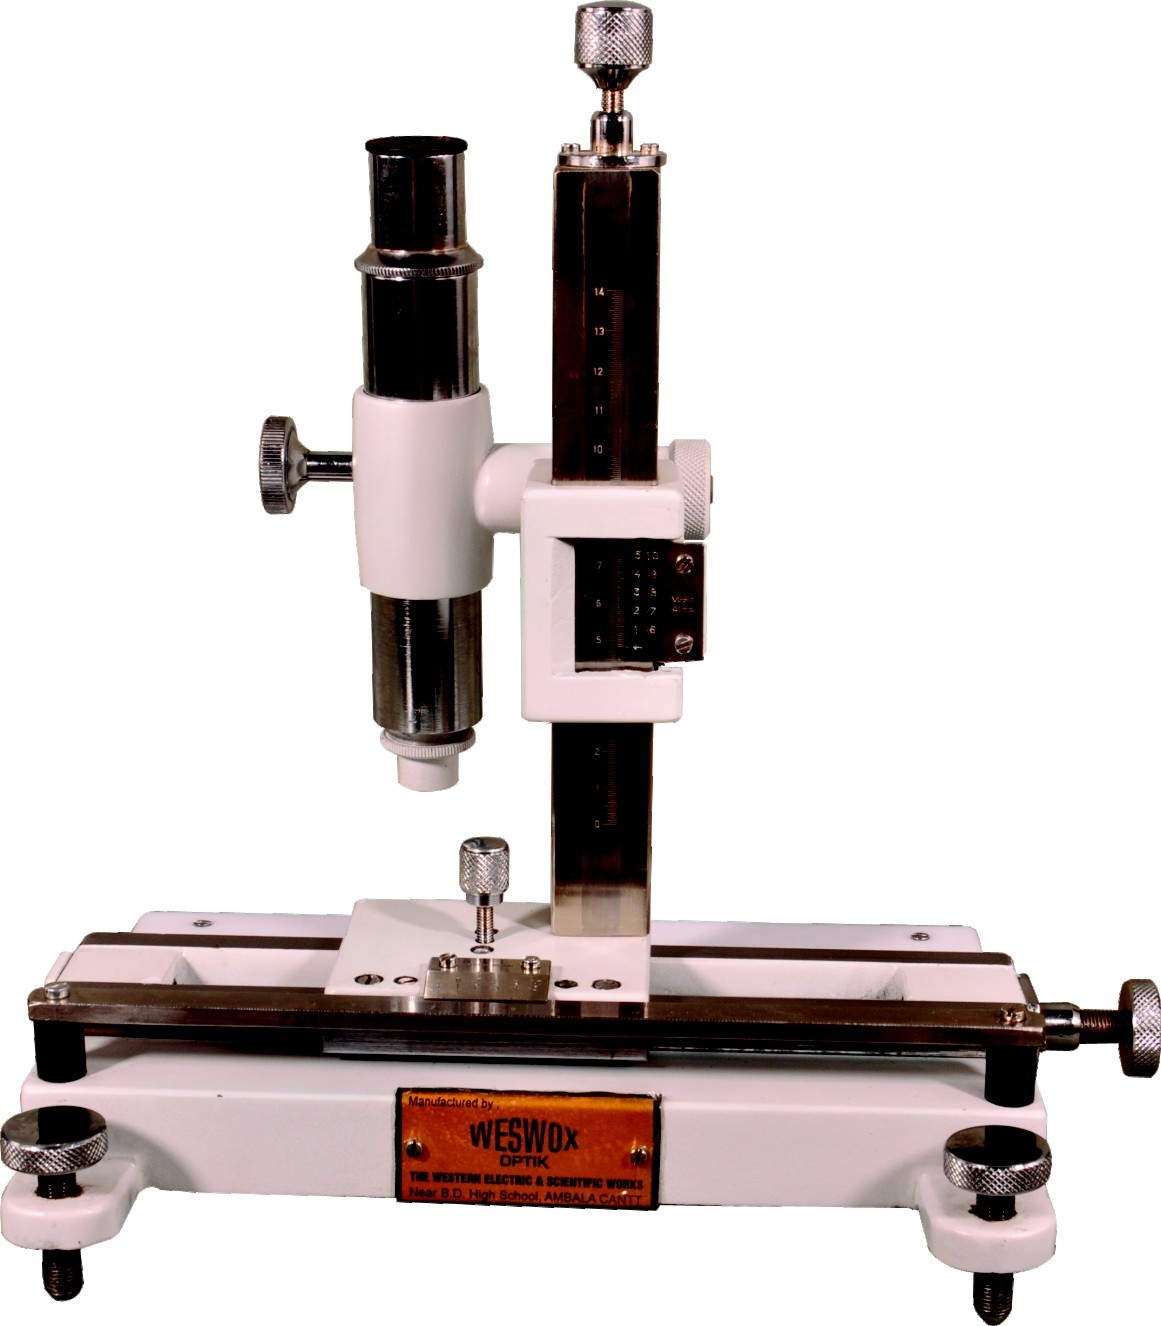 THREE 3-MOTION VERNIER/TRAVELLING MICROSCOPE